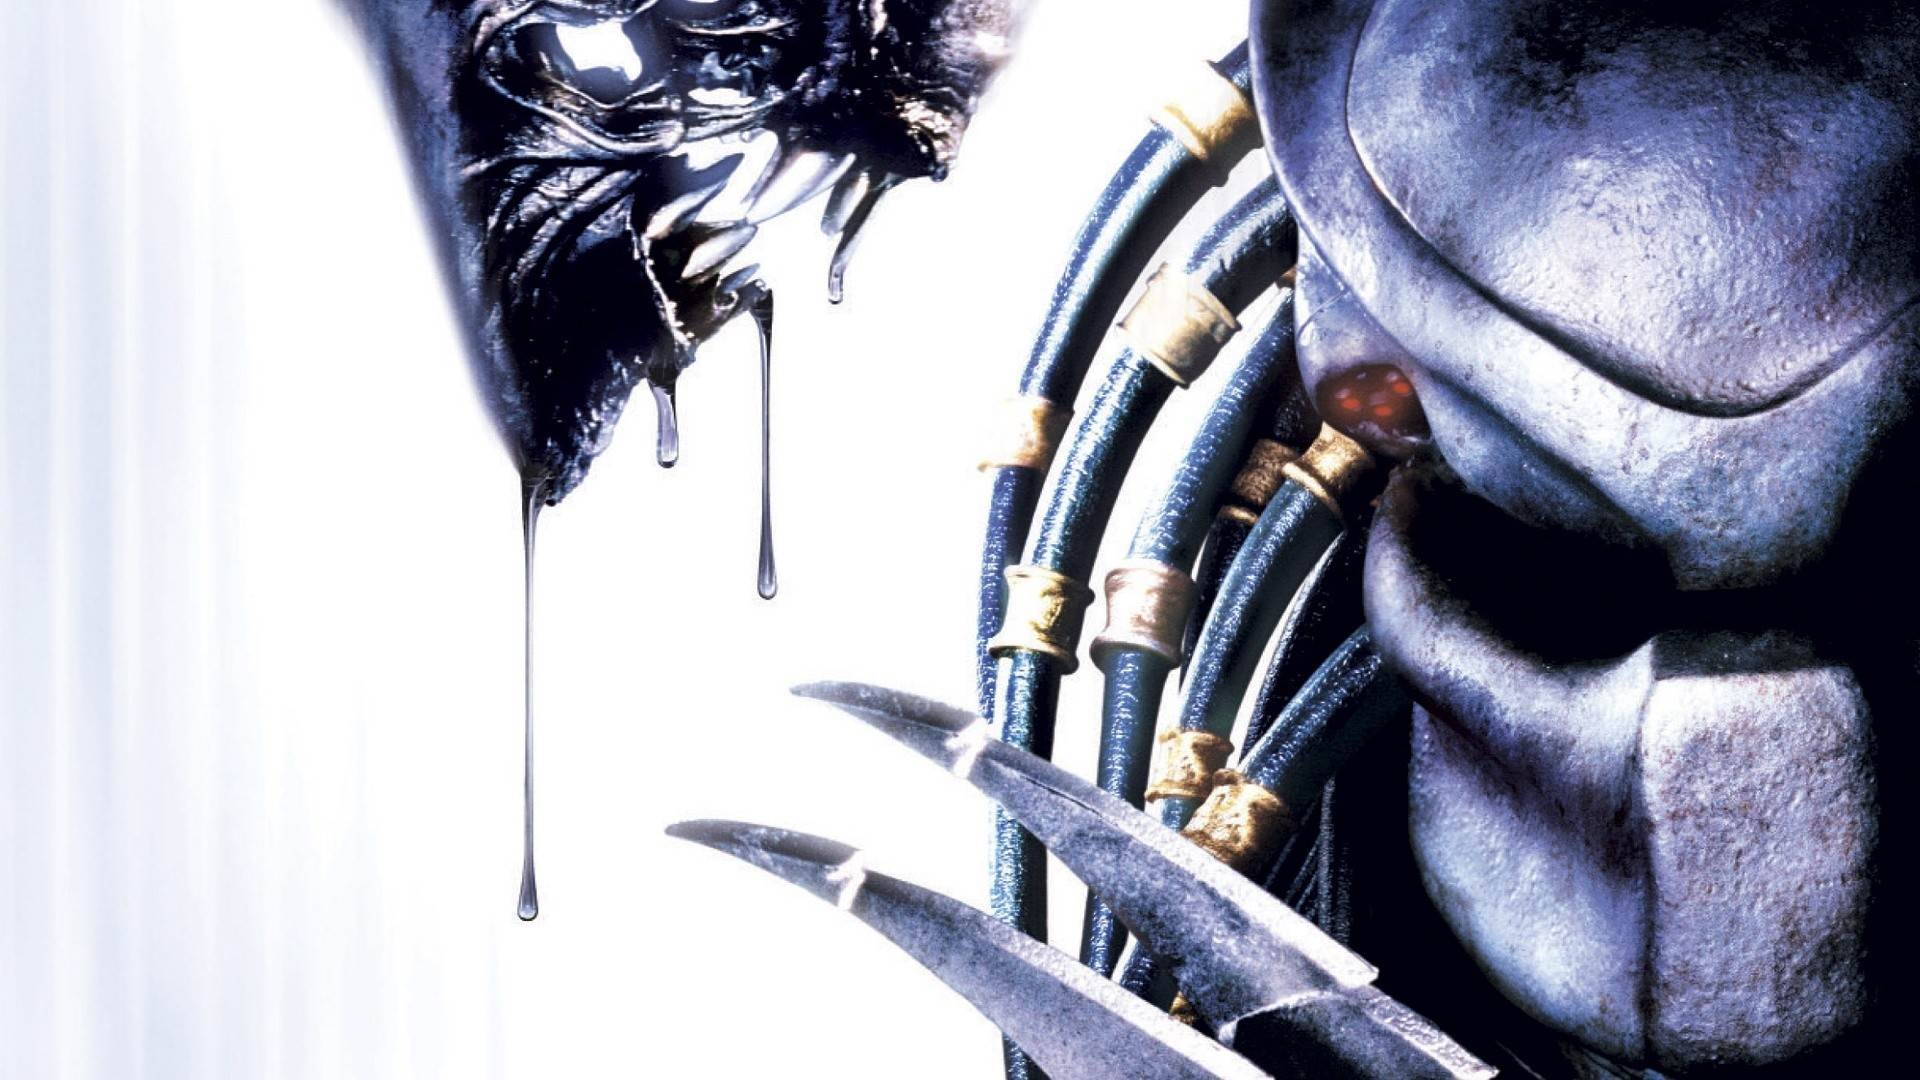 Alien Vs Predator Wallpaper 2 Adorable Wallpapers